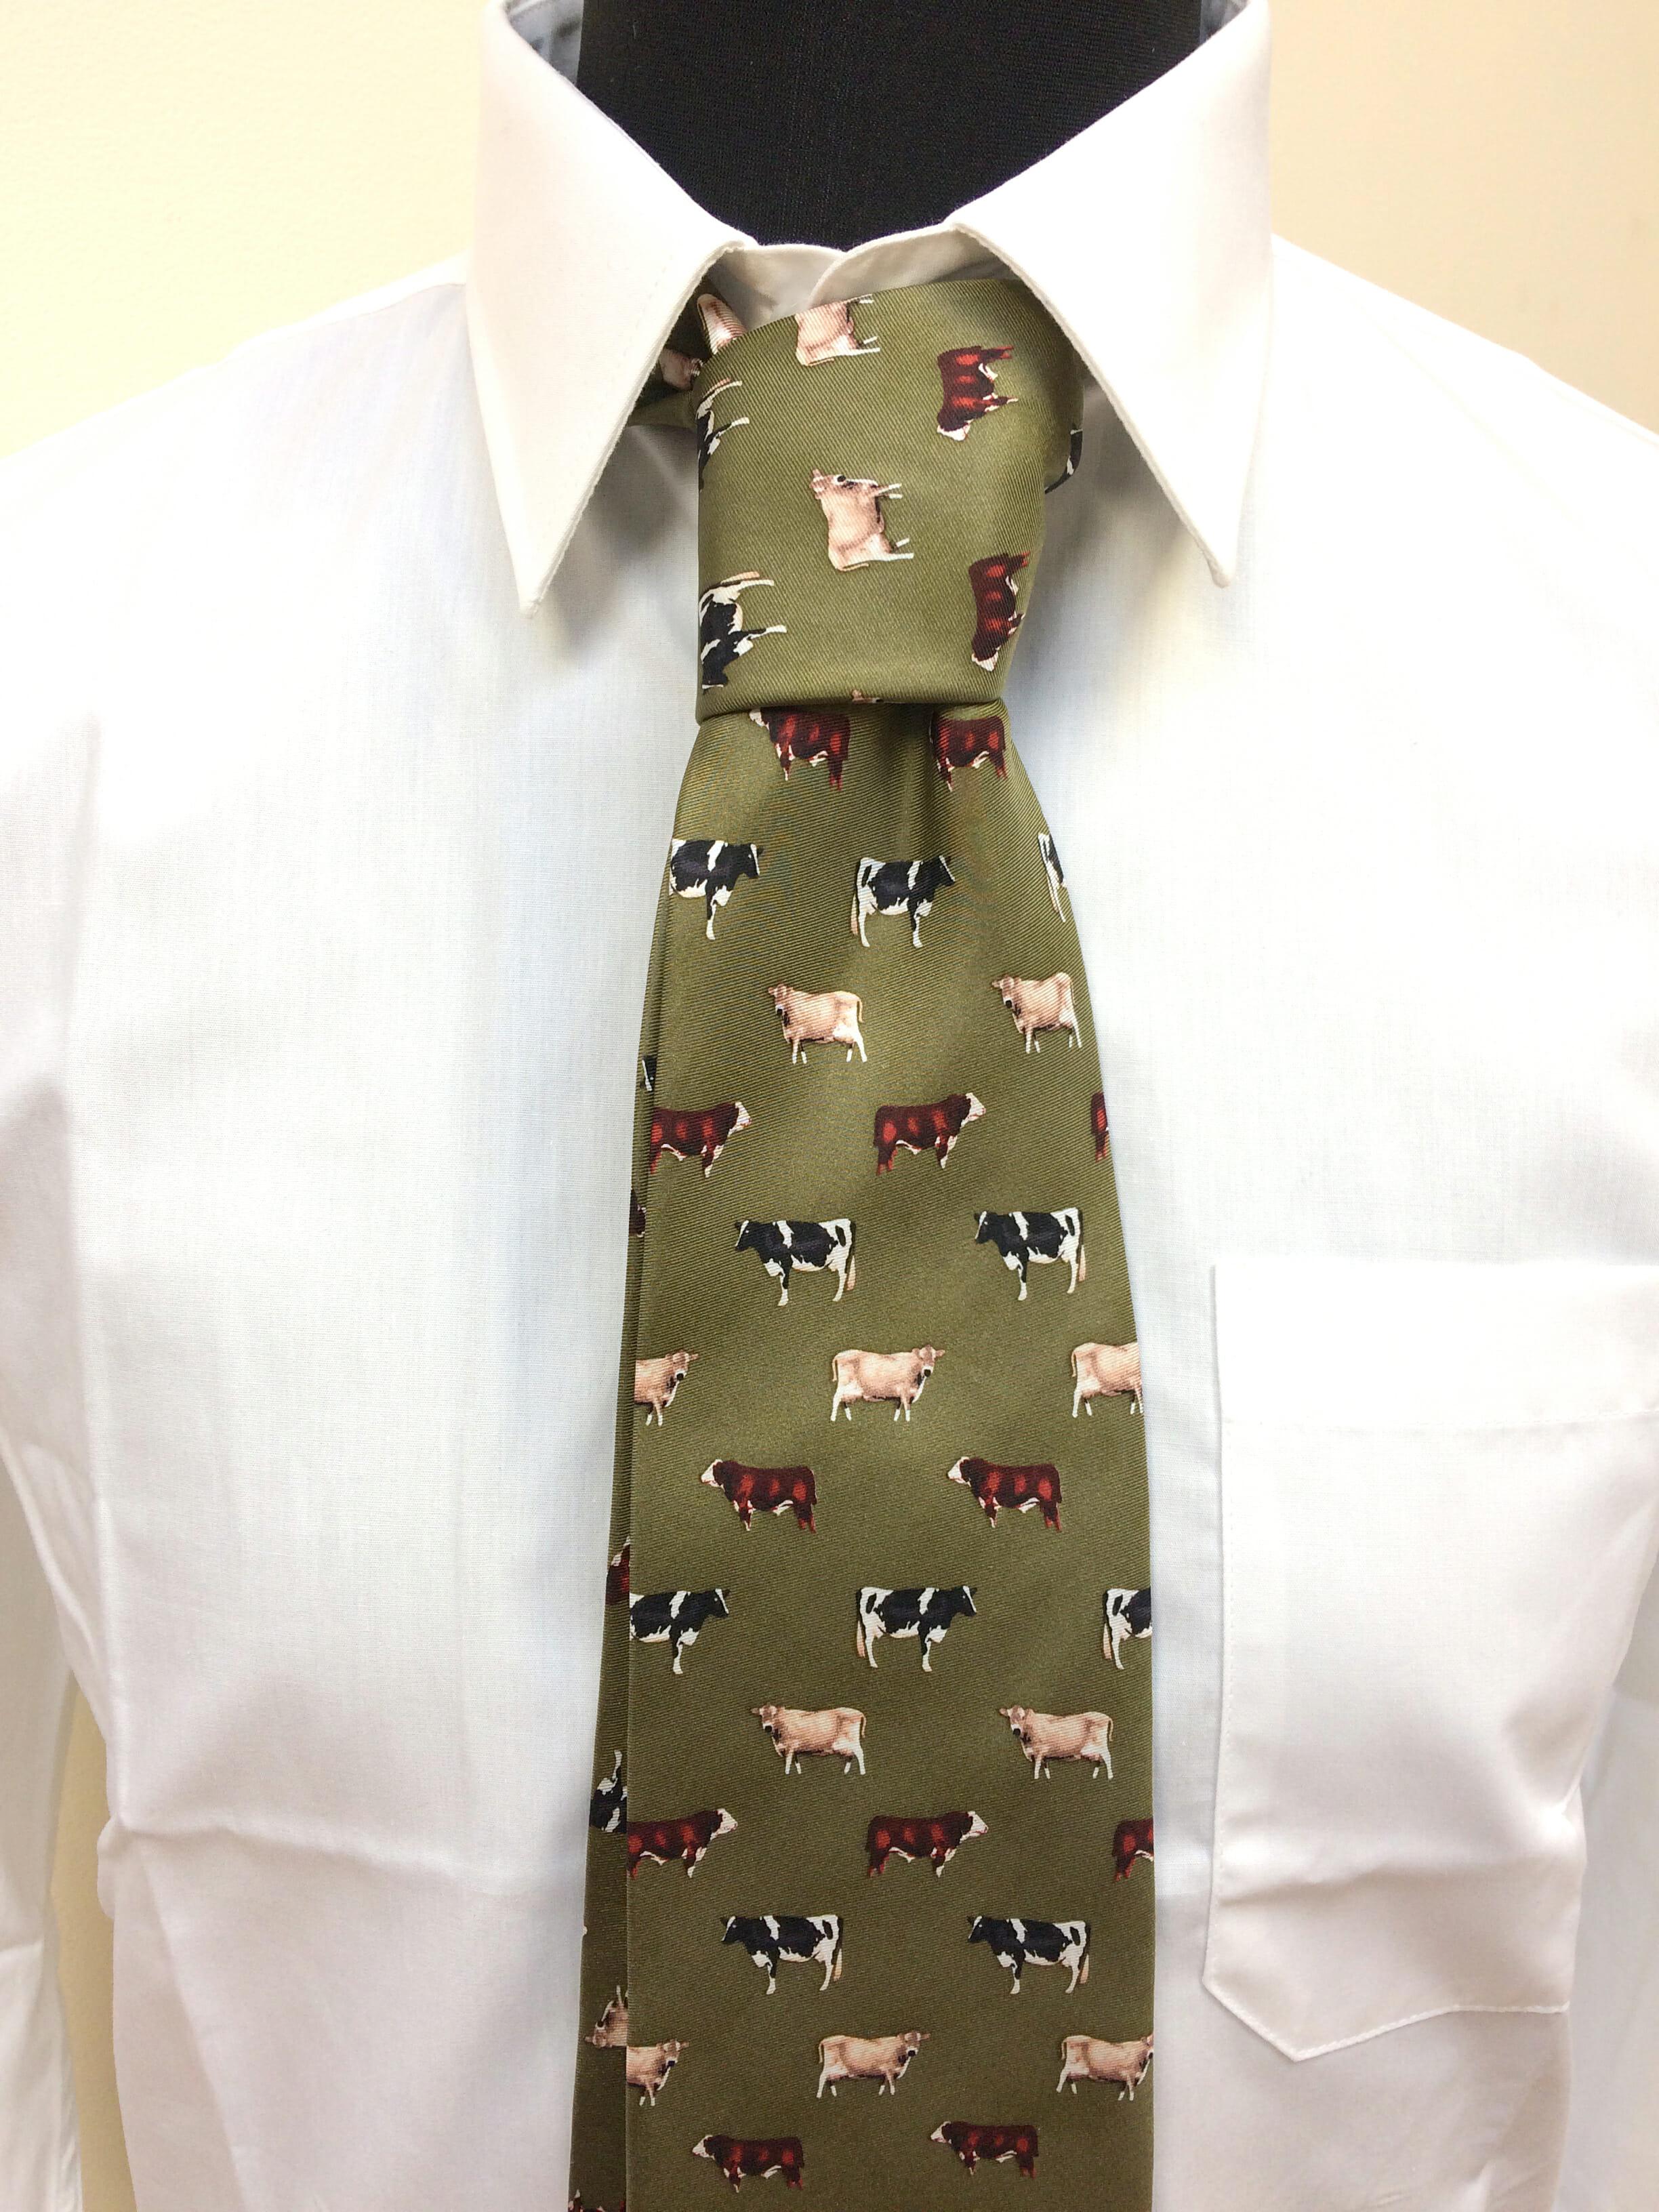 Multibreed Cattle Tie